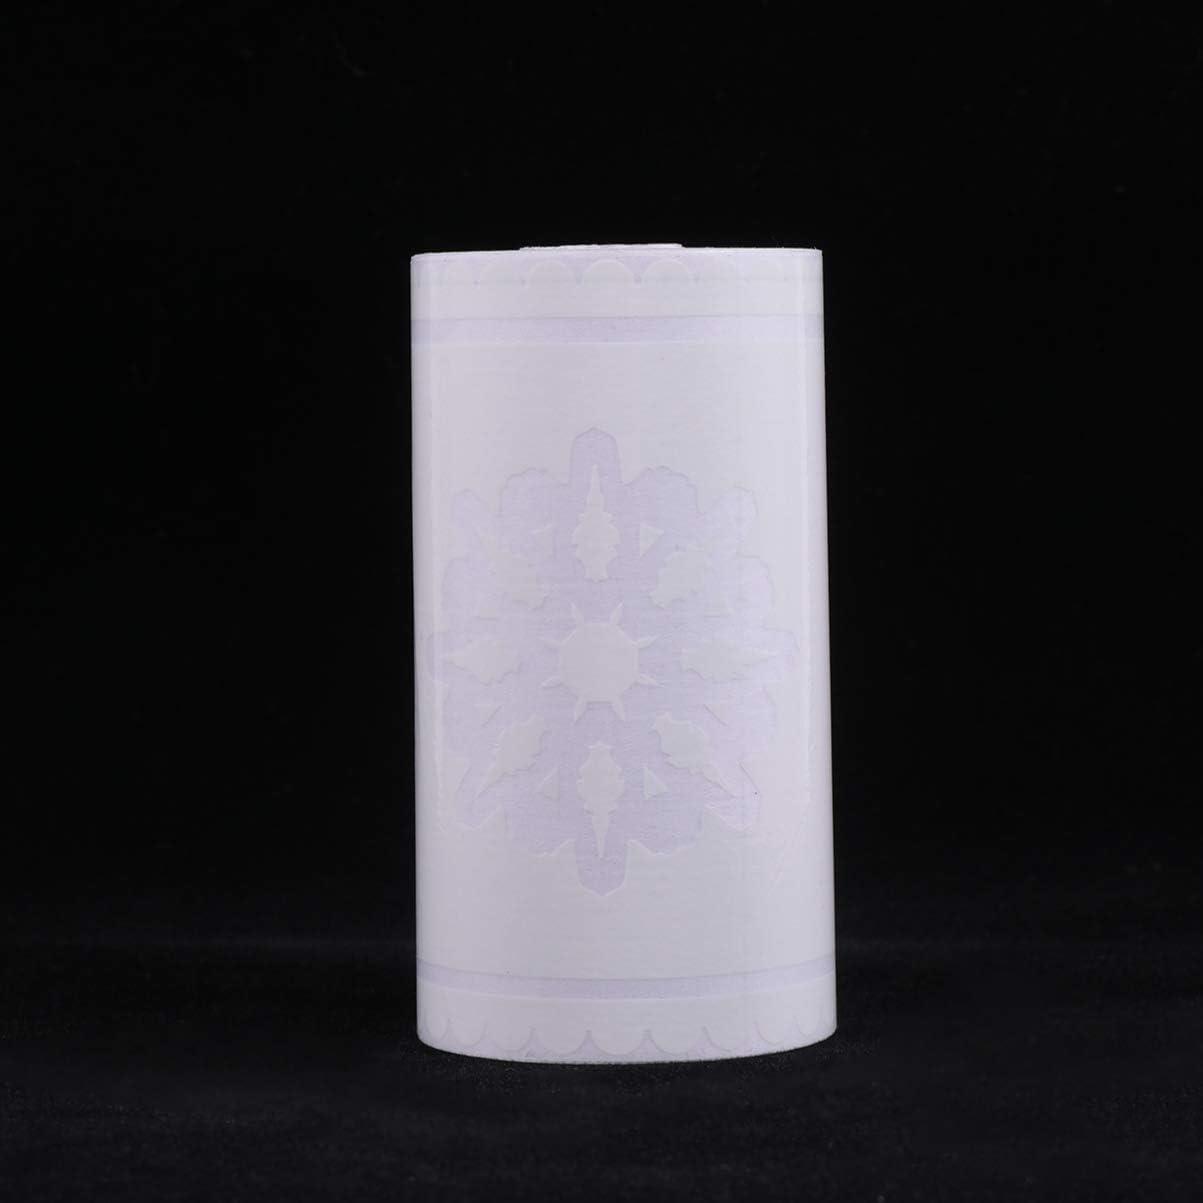 STOBOK Papel Tapiz de Encaje Borde Decorativo Adhesivo Impermeable Copo de Nieve Patr/ón Cintura L/ínea Calcoman/ías de Pared para Espejo Ventana Puerta Decoraci/ón